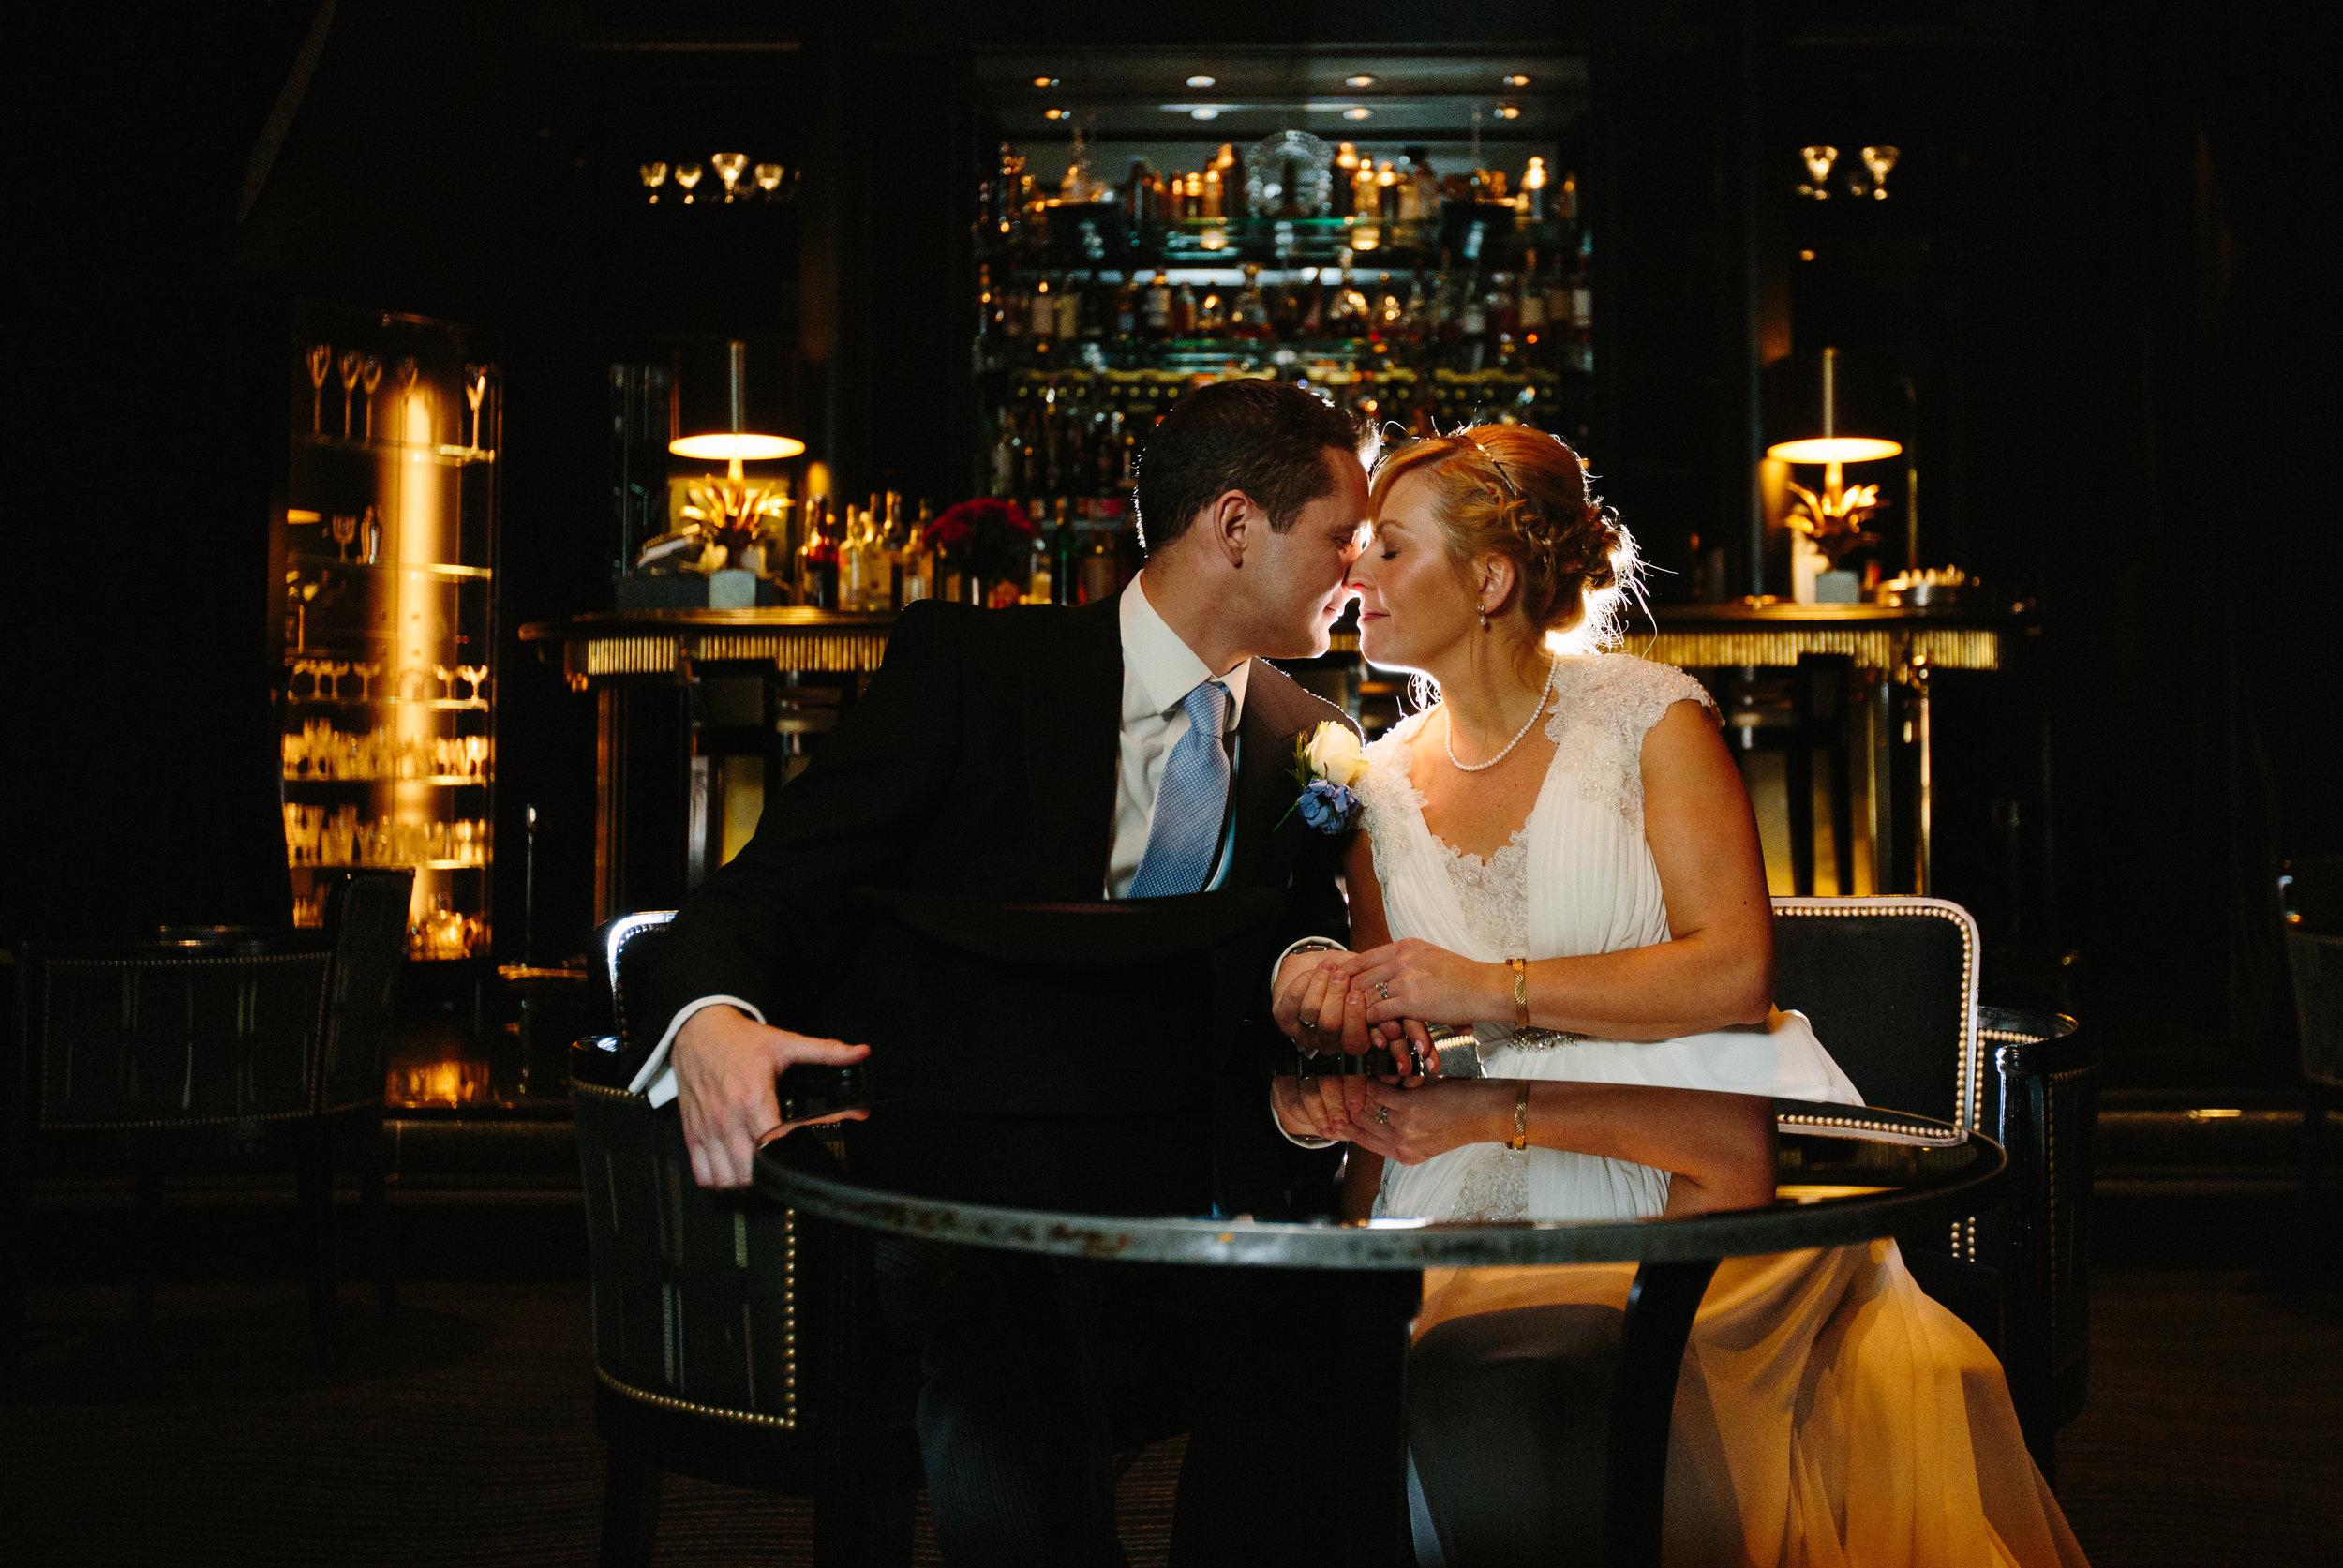 london-wedding-photography-wimbledon-wandsworth-town-hall-savoy-hotel-bridal-portrait-beaufort-bar-76